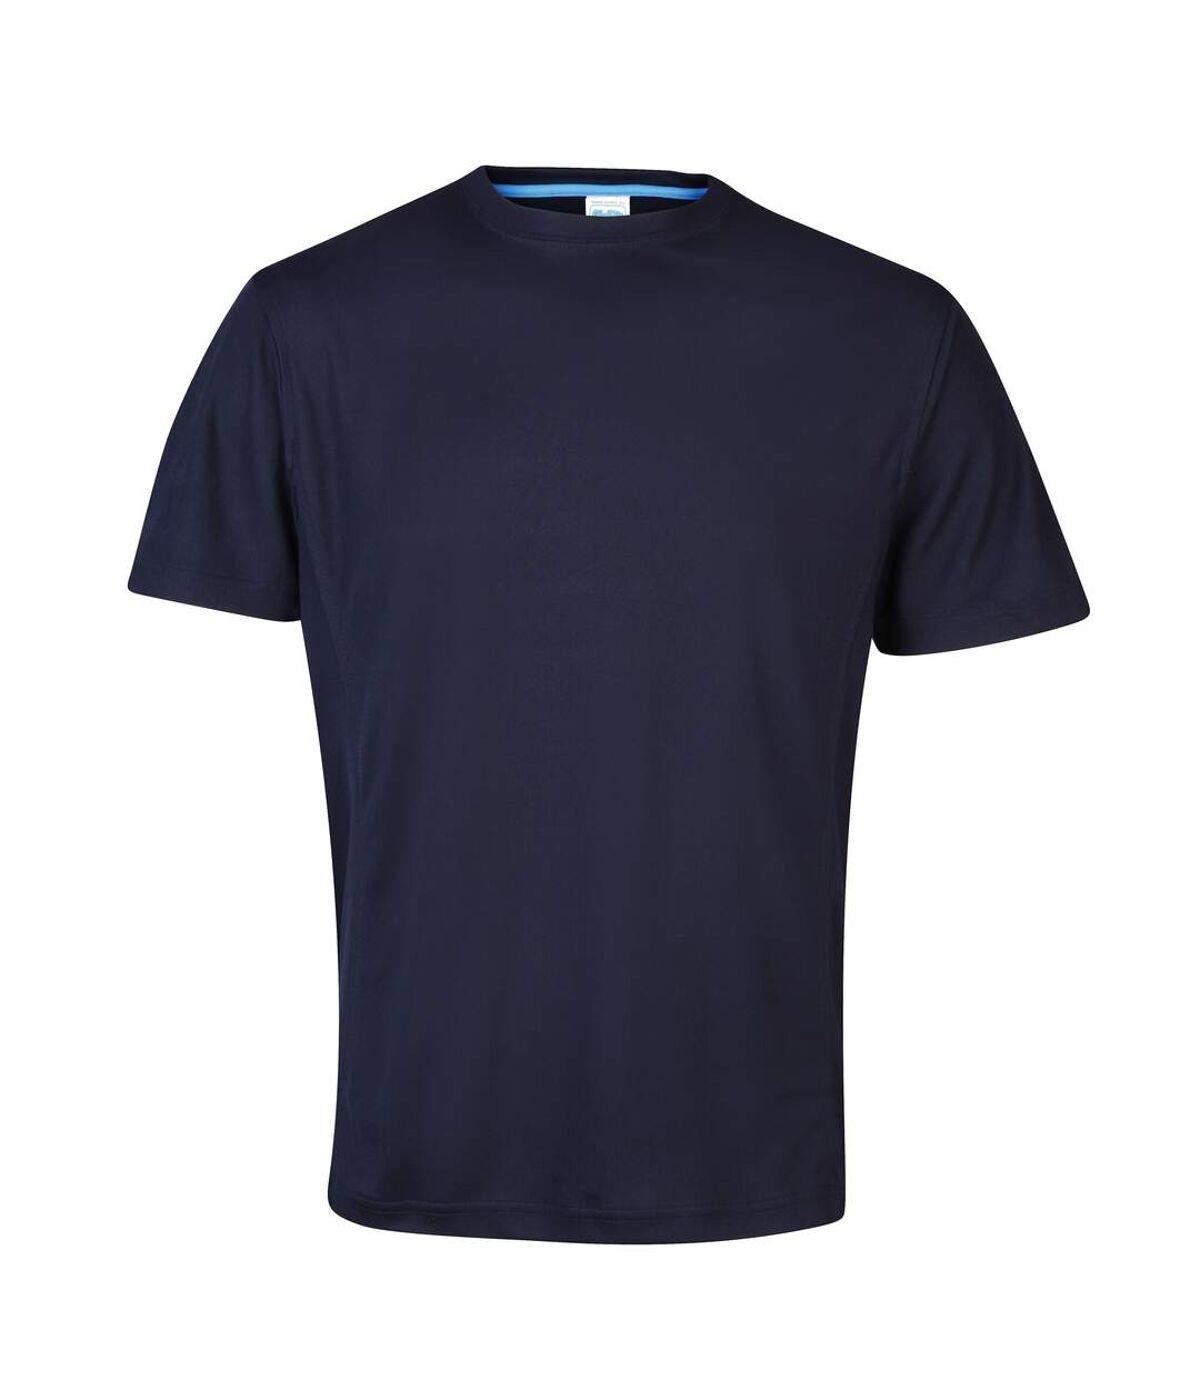 AWDis Cool Mens SuperCool Crew Sports Performance T-Shirt (French Navy) - UTRW2539